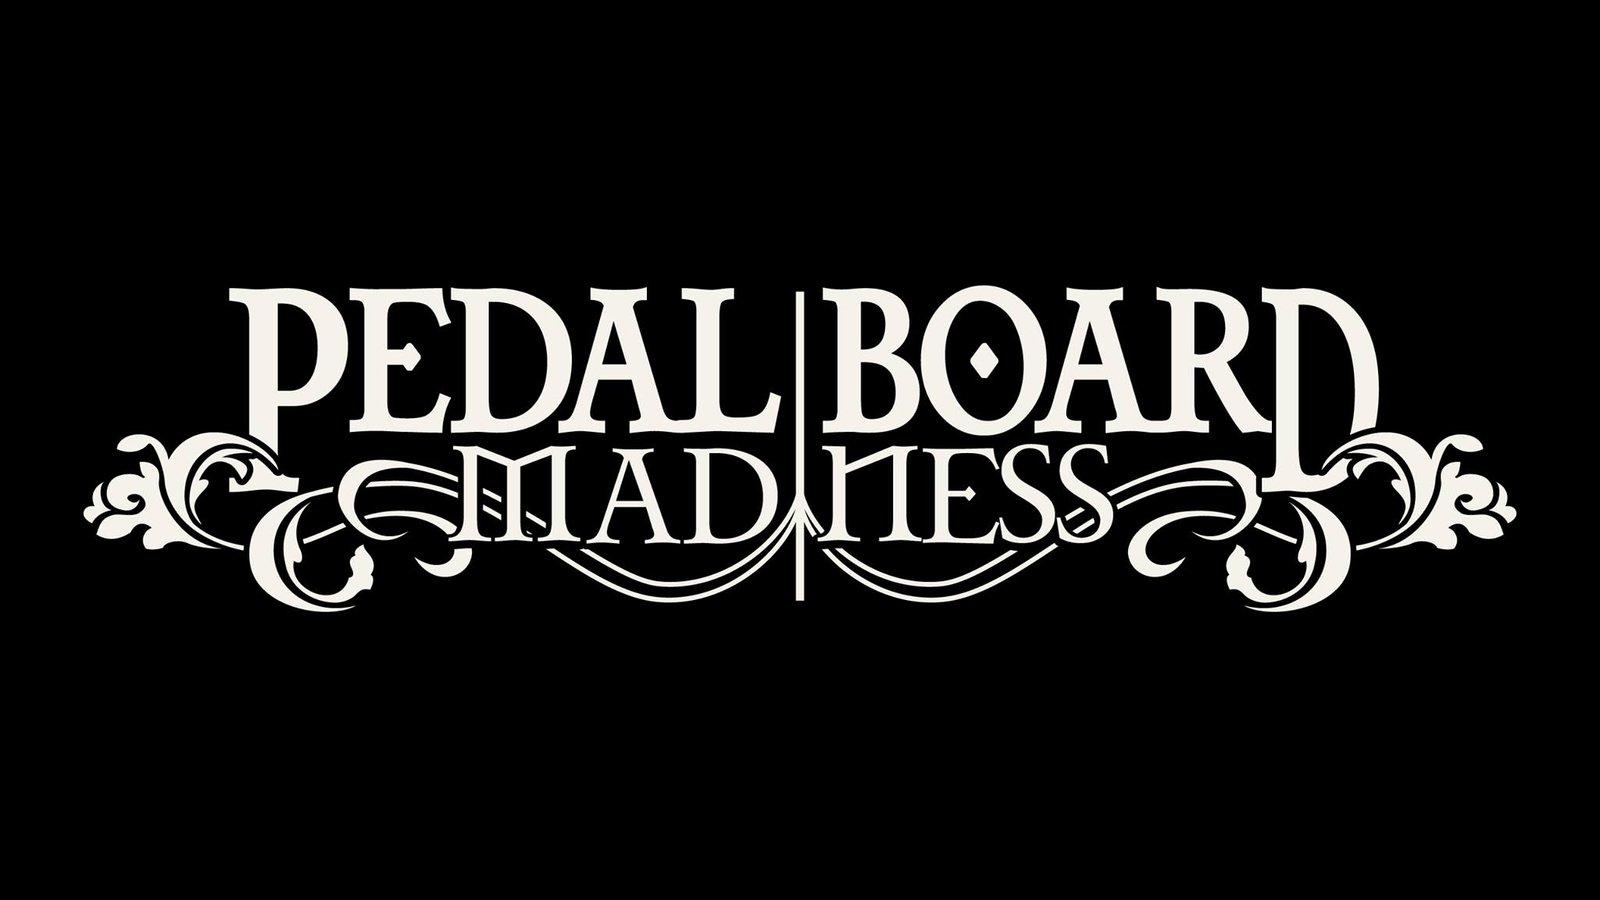 Pedalboard Madness